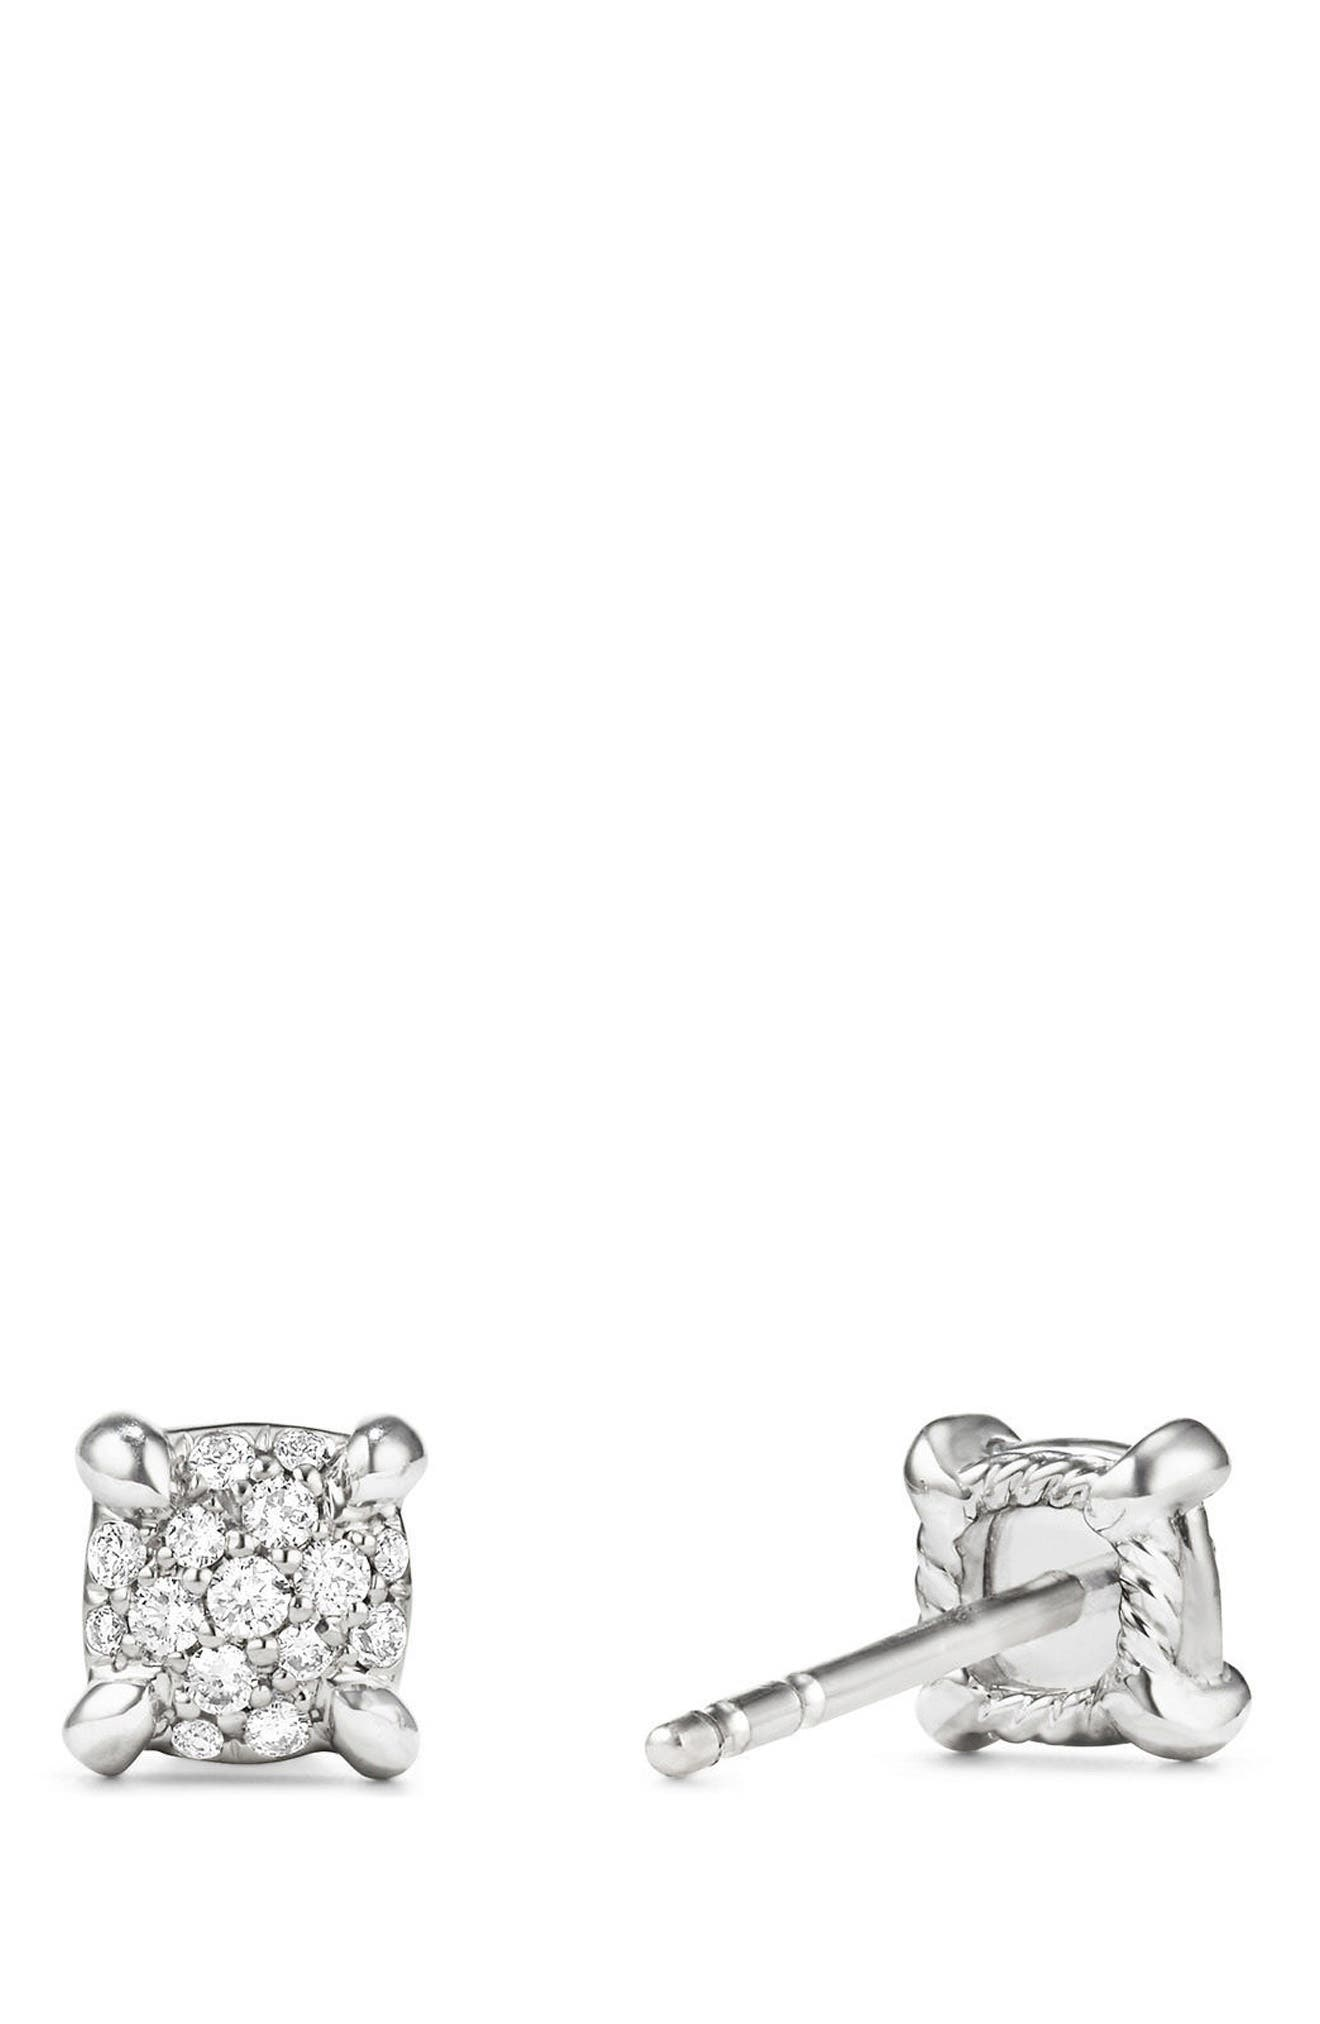 Châtelaine Stud Earrings with Diamonds,                             Alternate thumbnail 2, color,                             710